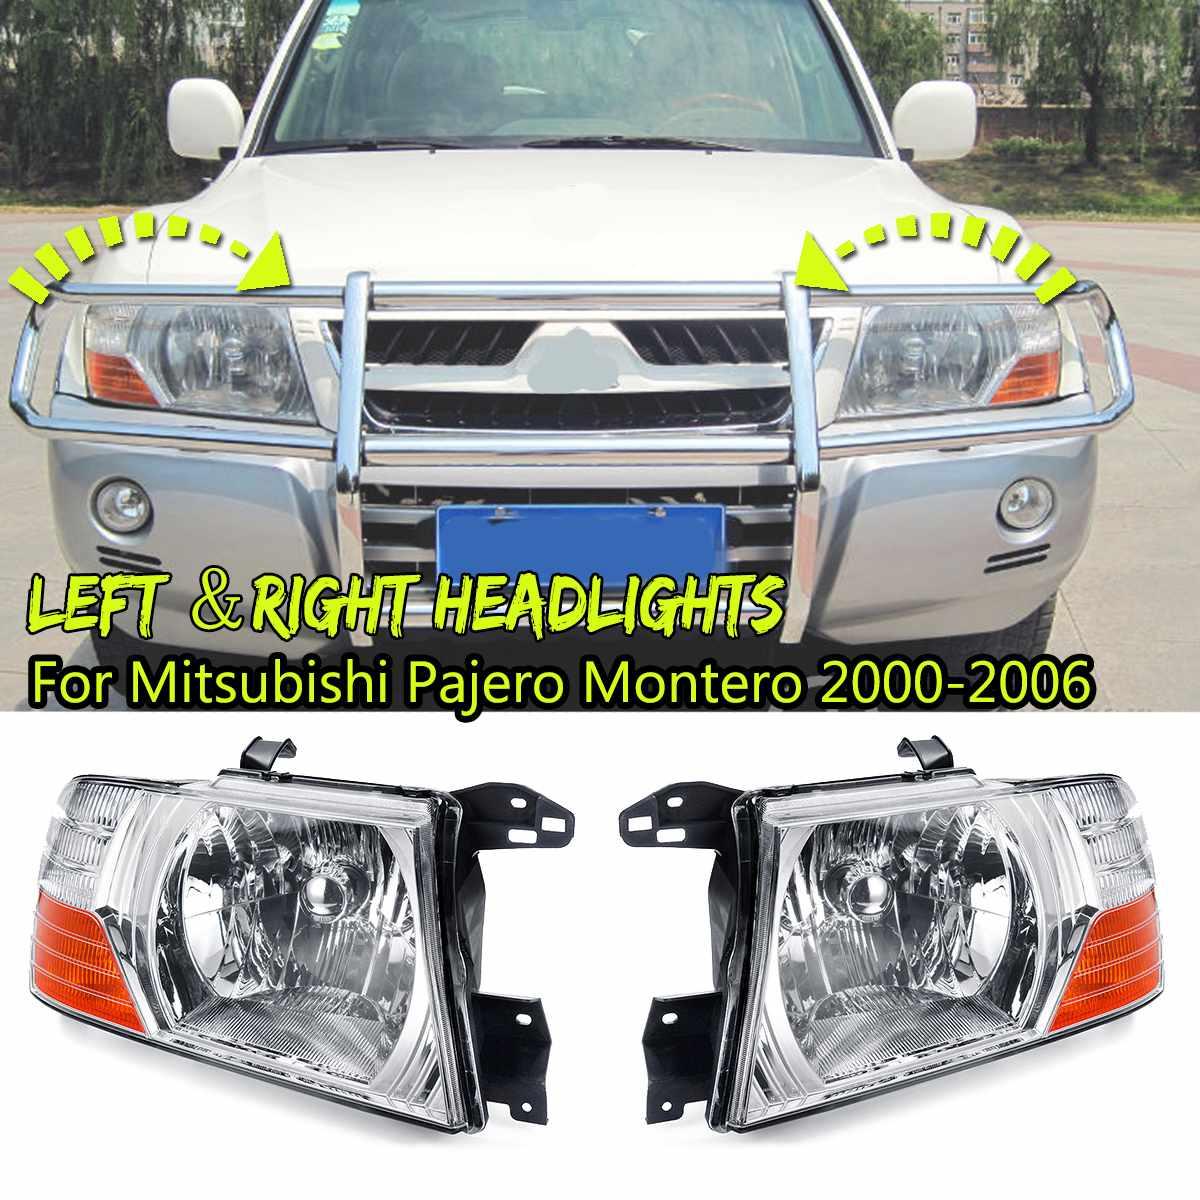 12V Car Light Assembly Fog Light Headlight For Mitsubishi Pajero Montero 2000 2001 2002 2003 2004 2005 2006